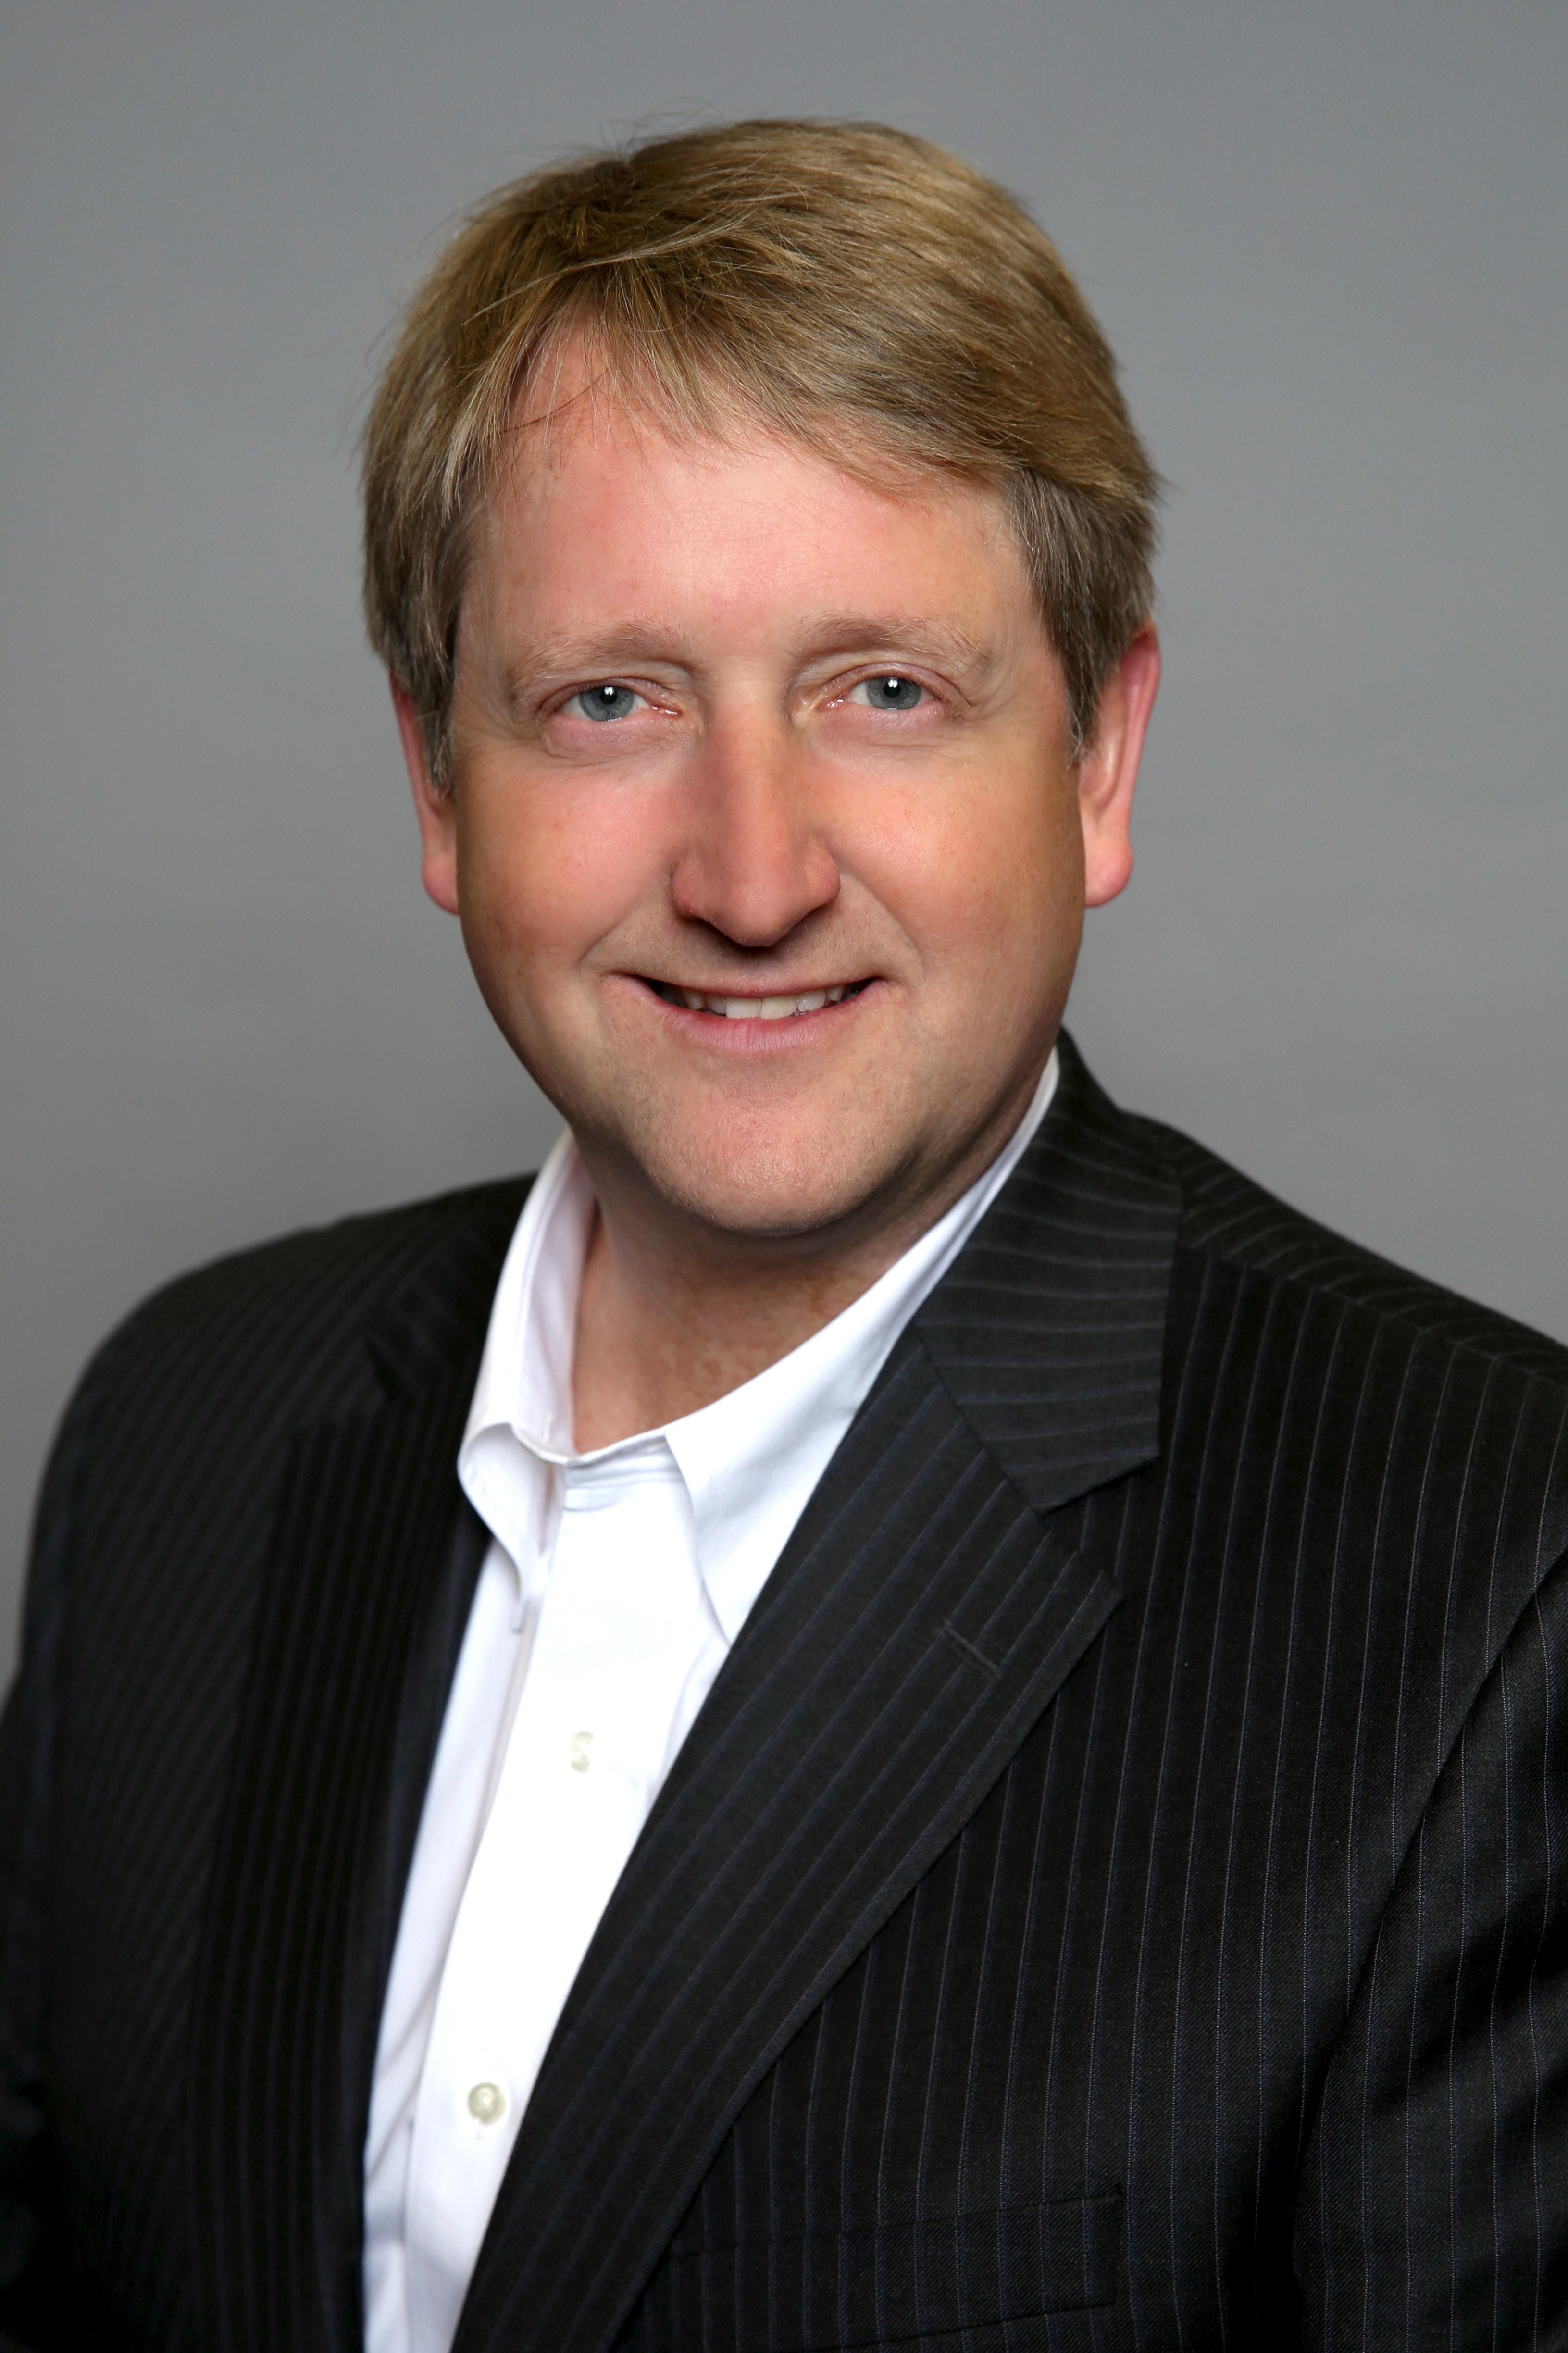 Gunnar Hubbard FAIA, LEED Fellow